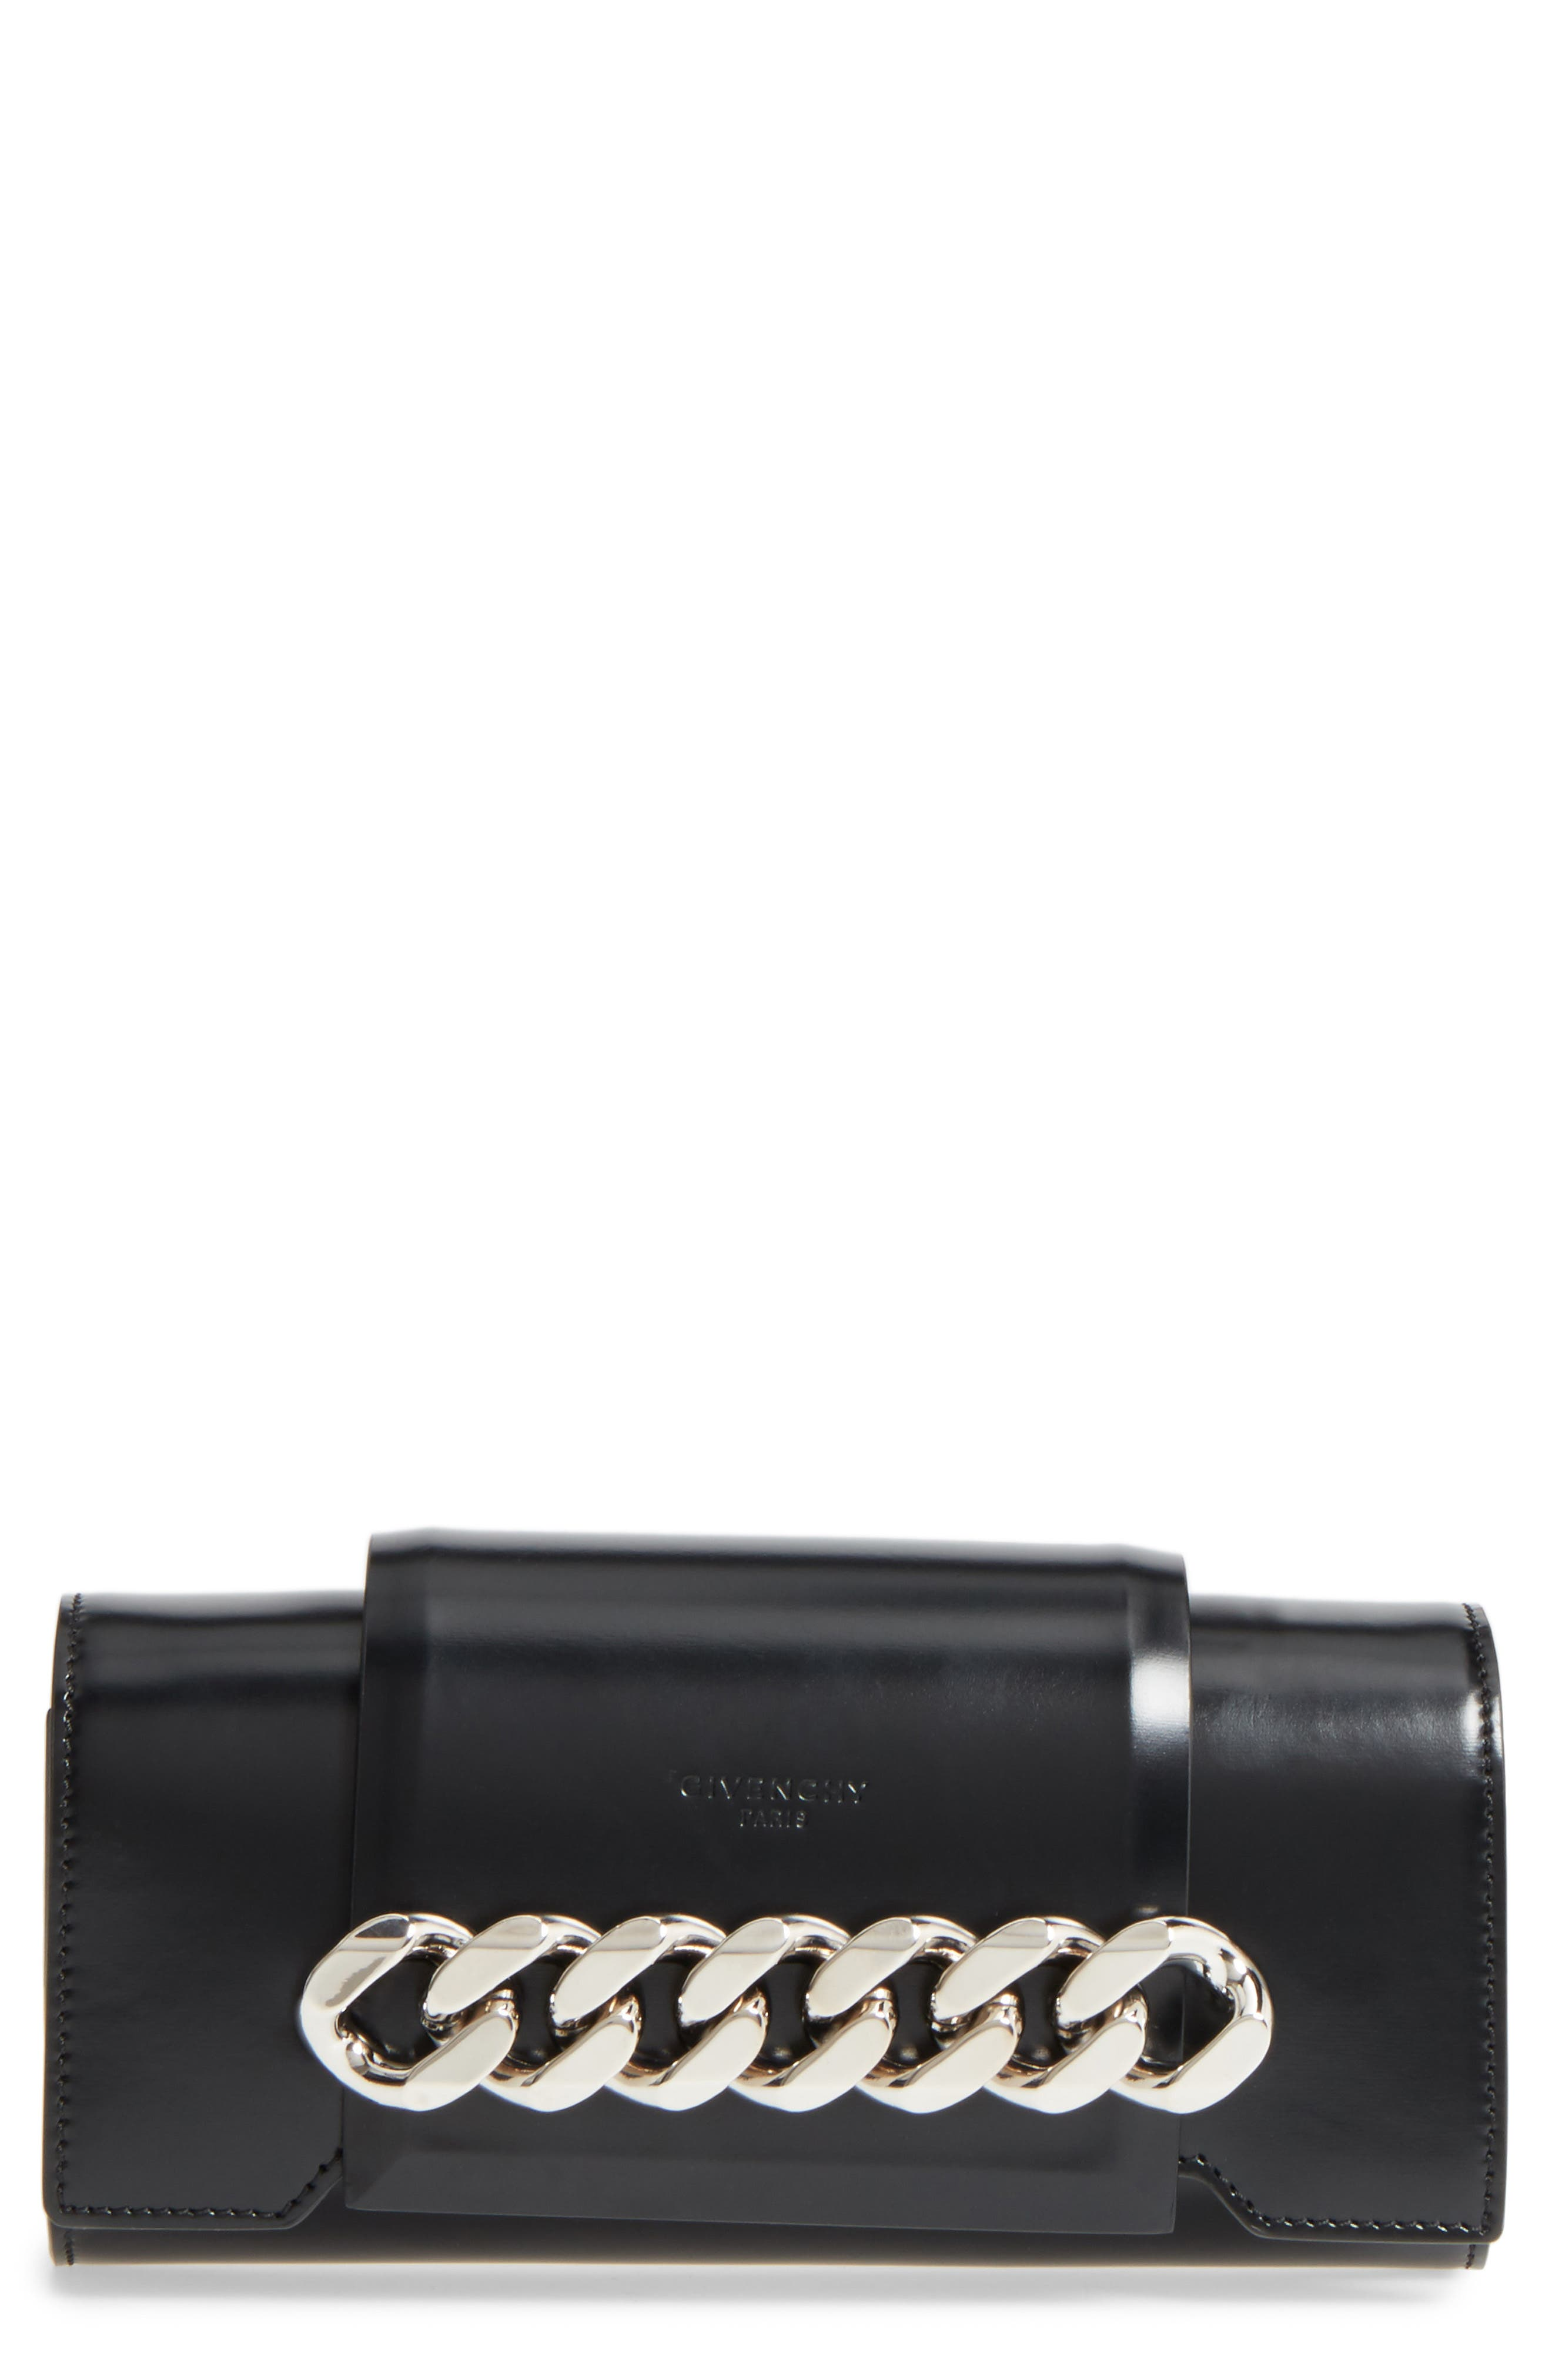 Mini Infinity Calfskin Leather Shoulder/Crossbody Bag,                             Main thumbnail 1, color,                             001